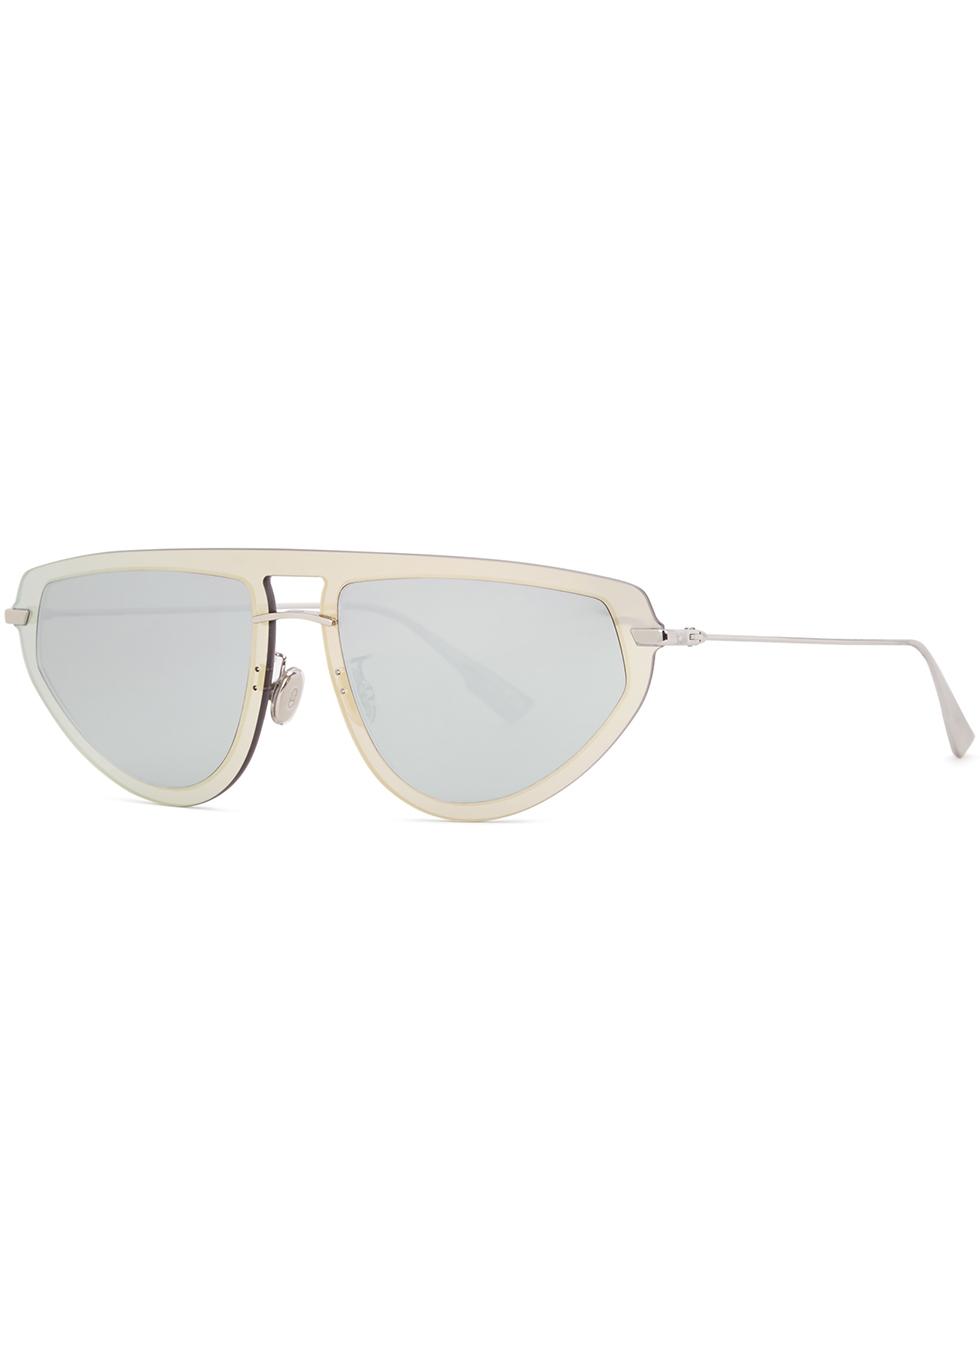 DiorUltimate2 D-frame sunglasses - Dior